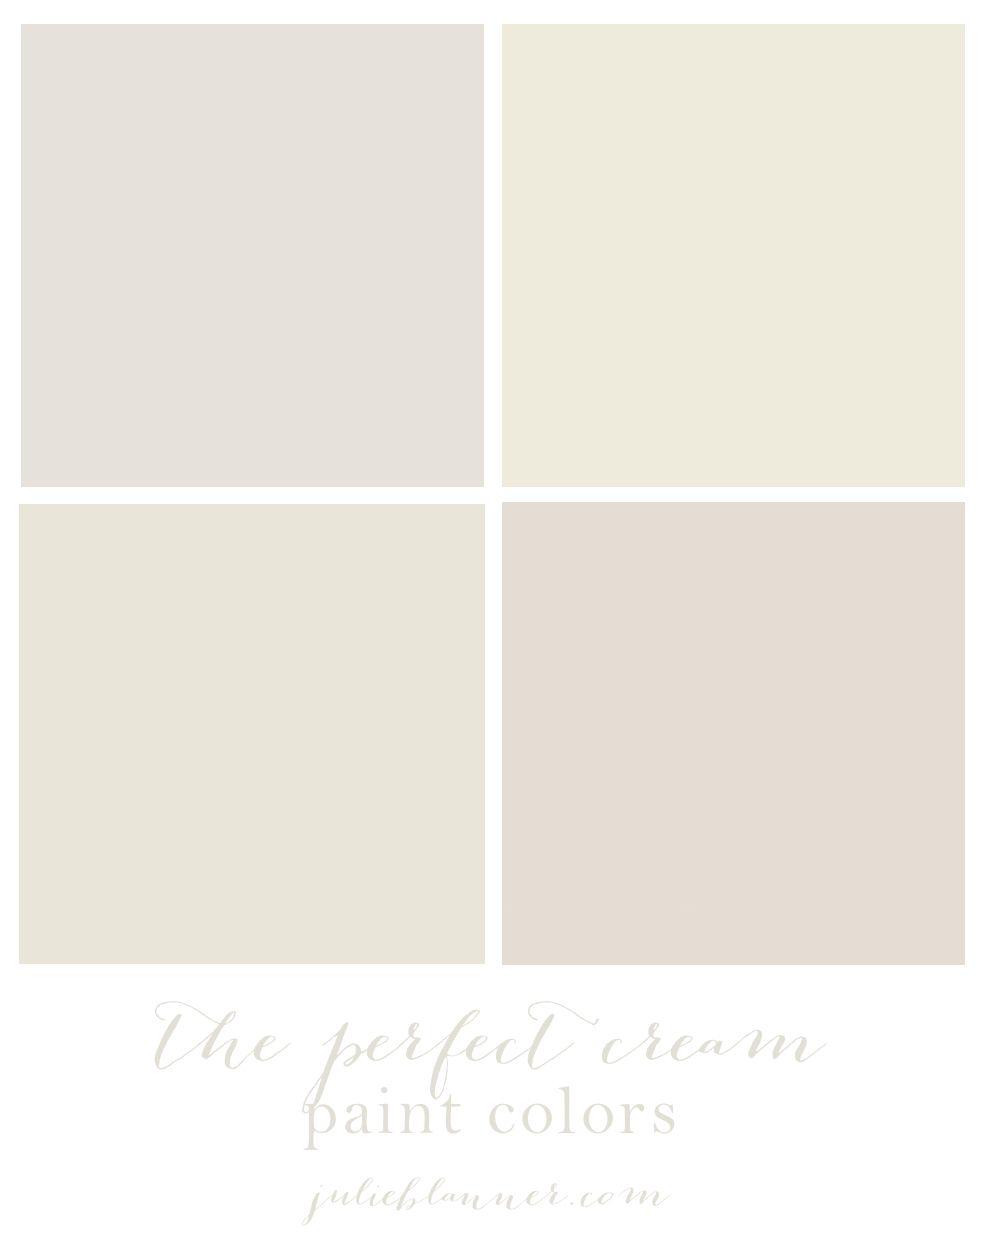 Cream Paint Colors on Pinterest